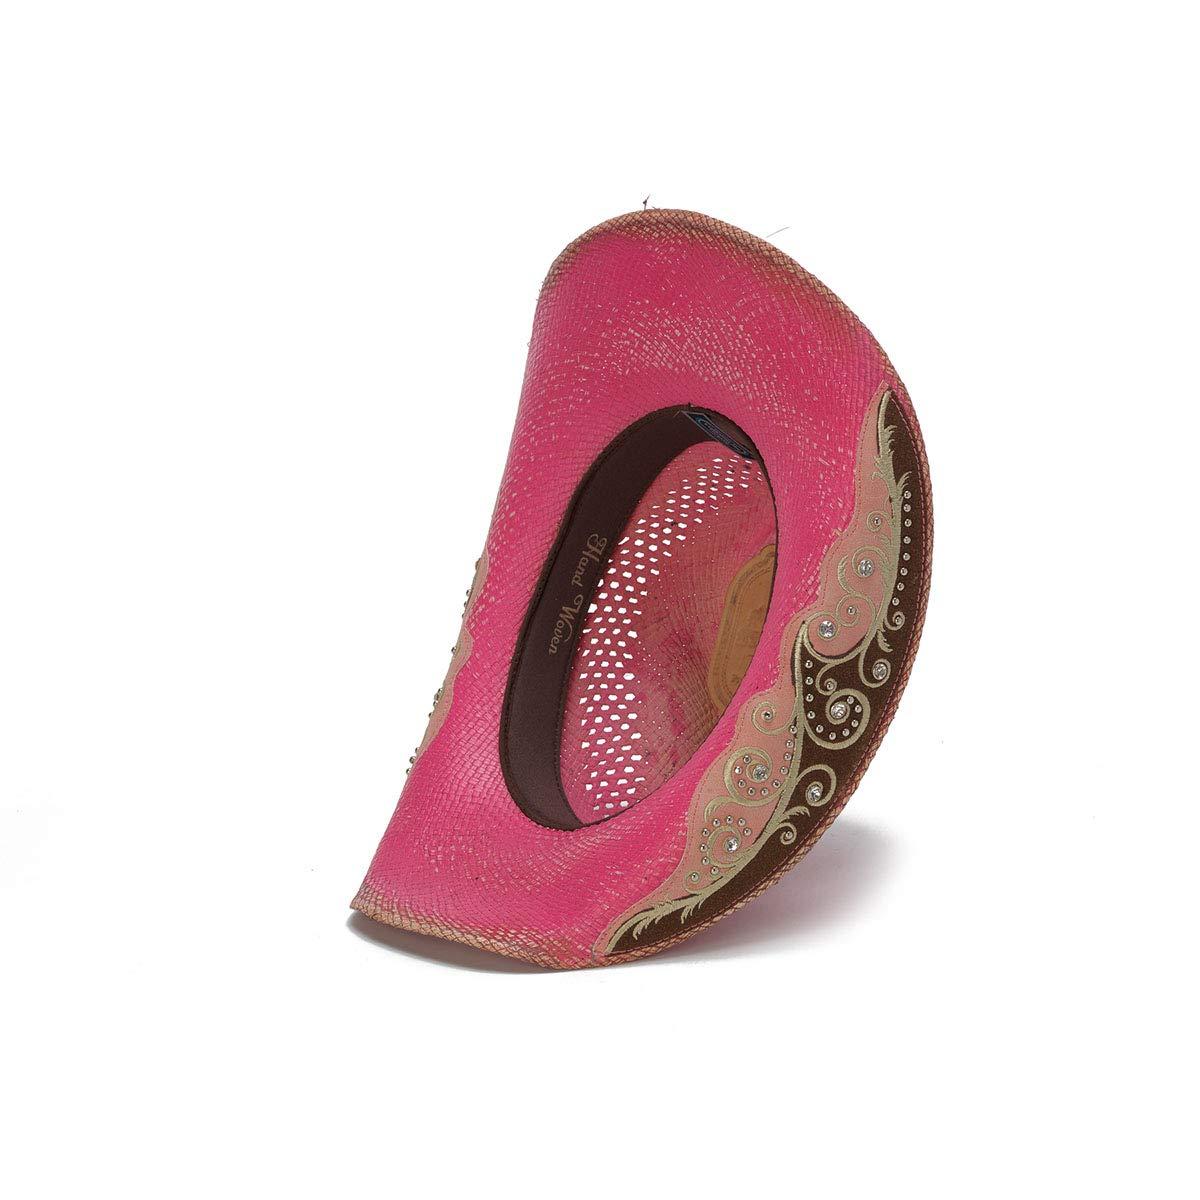 Stampede Hats Women's Burn The Breeze Flower Filigree Cowboy Hat S Pink by Stampede Hats (Image #5)